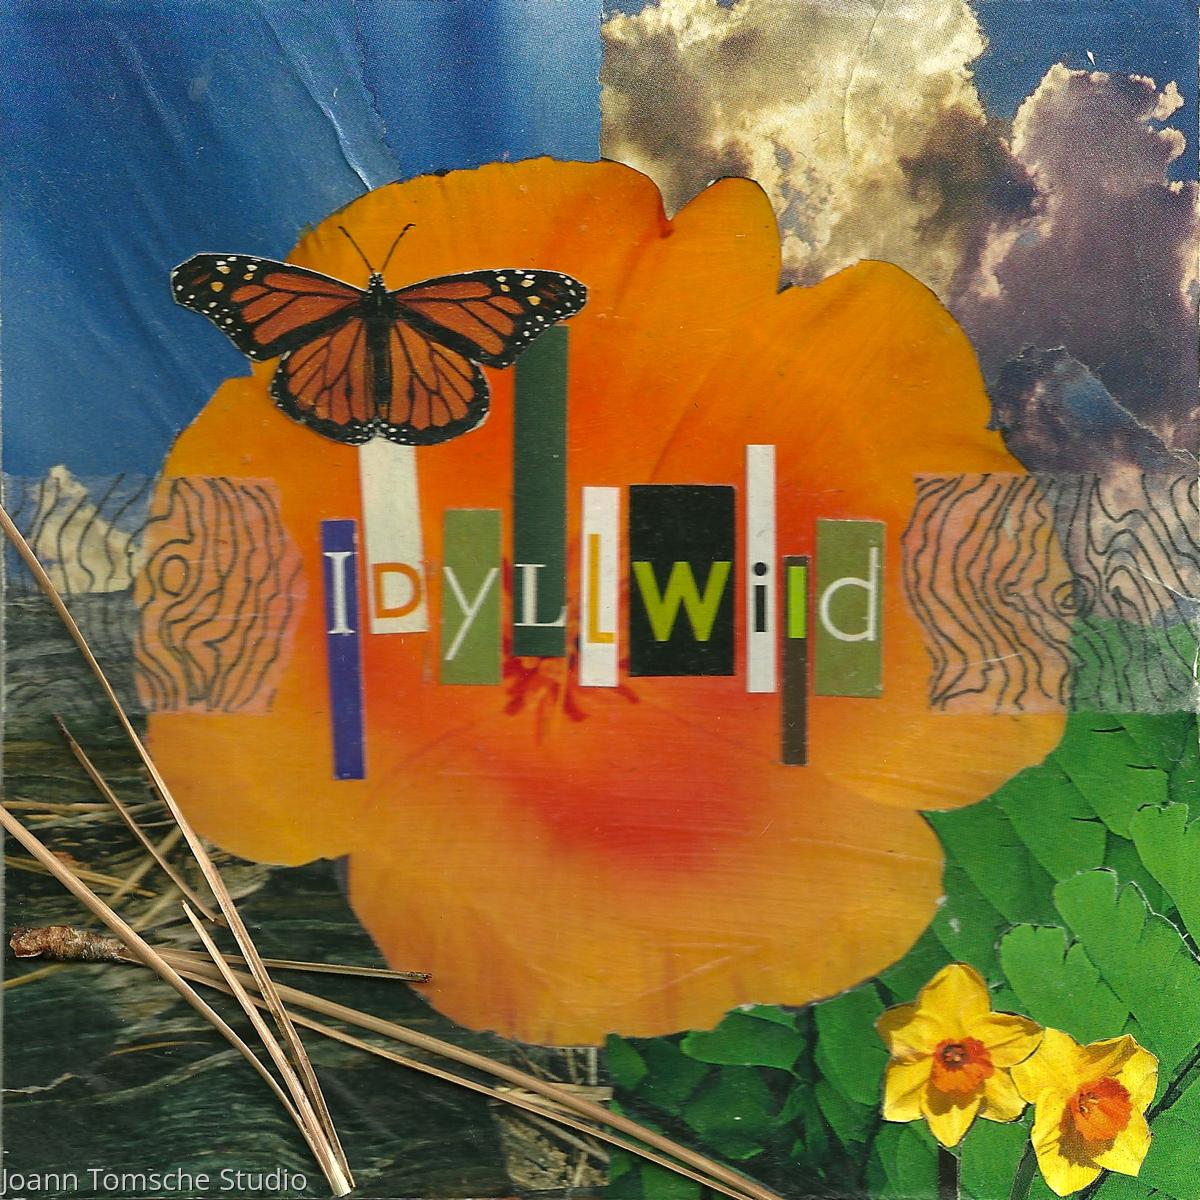 Idyllwild Poppy art tile (large view)